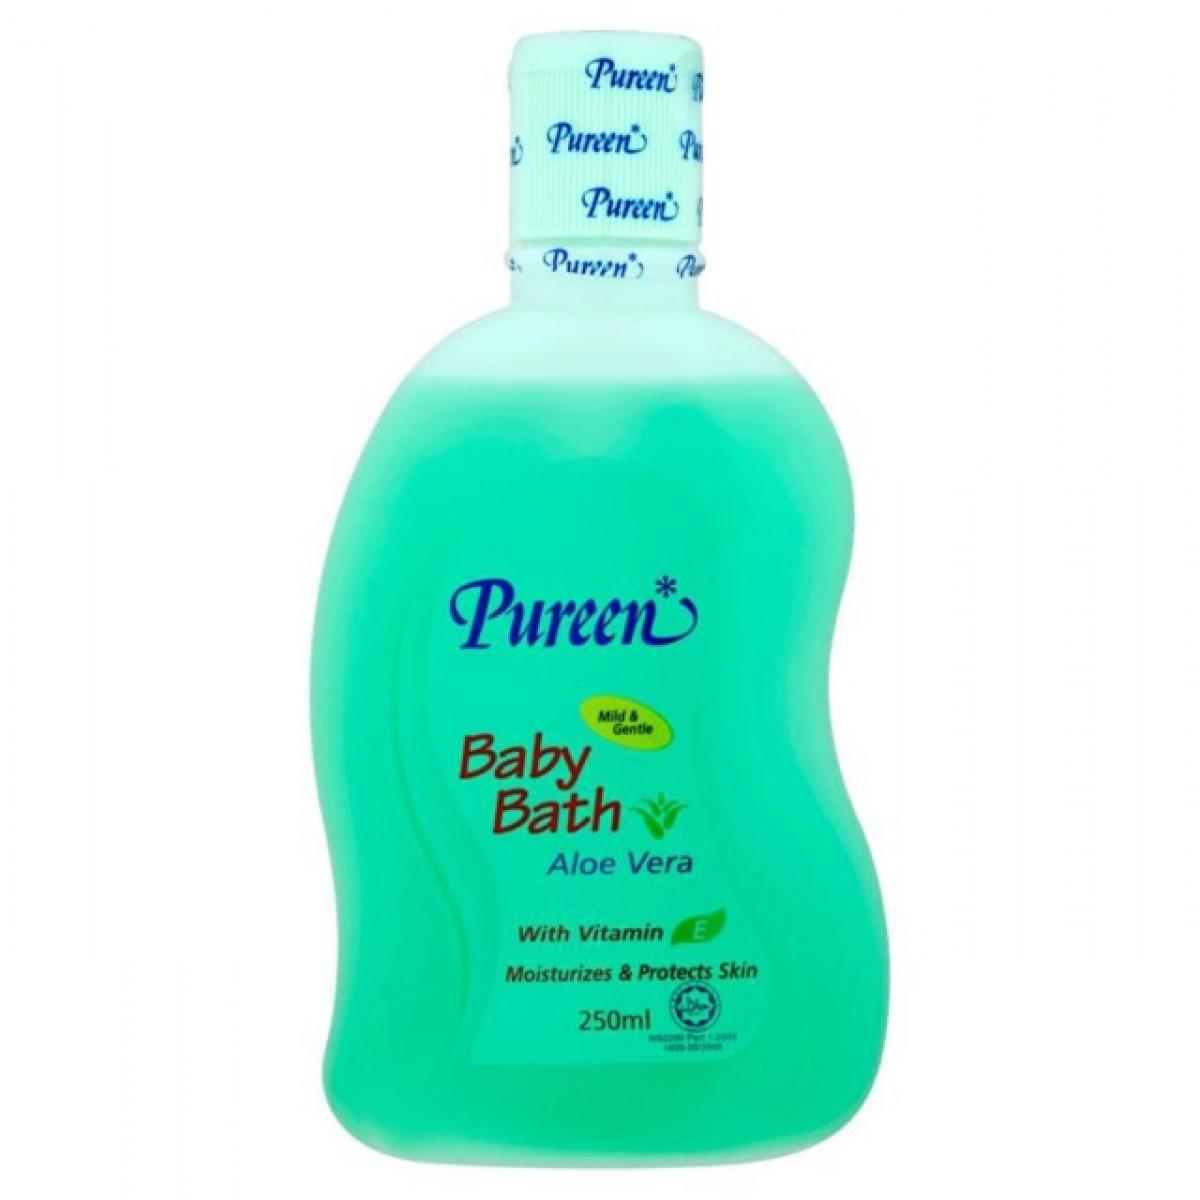 Pureen Baby Bath Aloe Vera (250ml) - Kico Baby Center